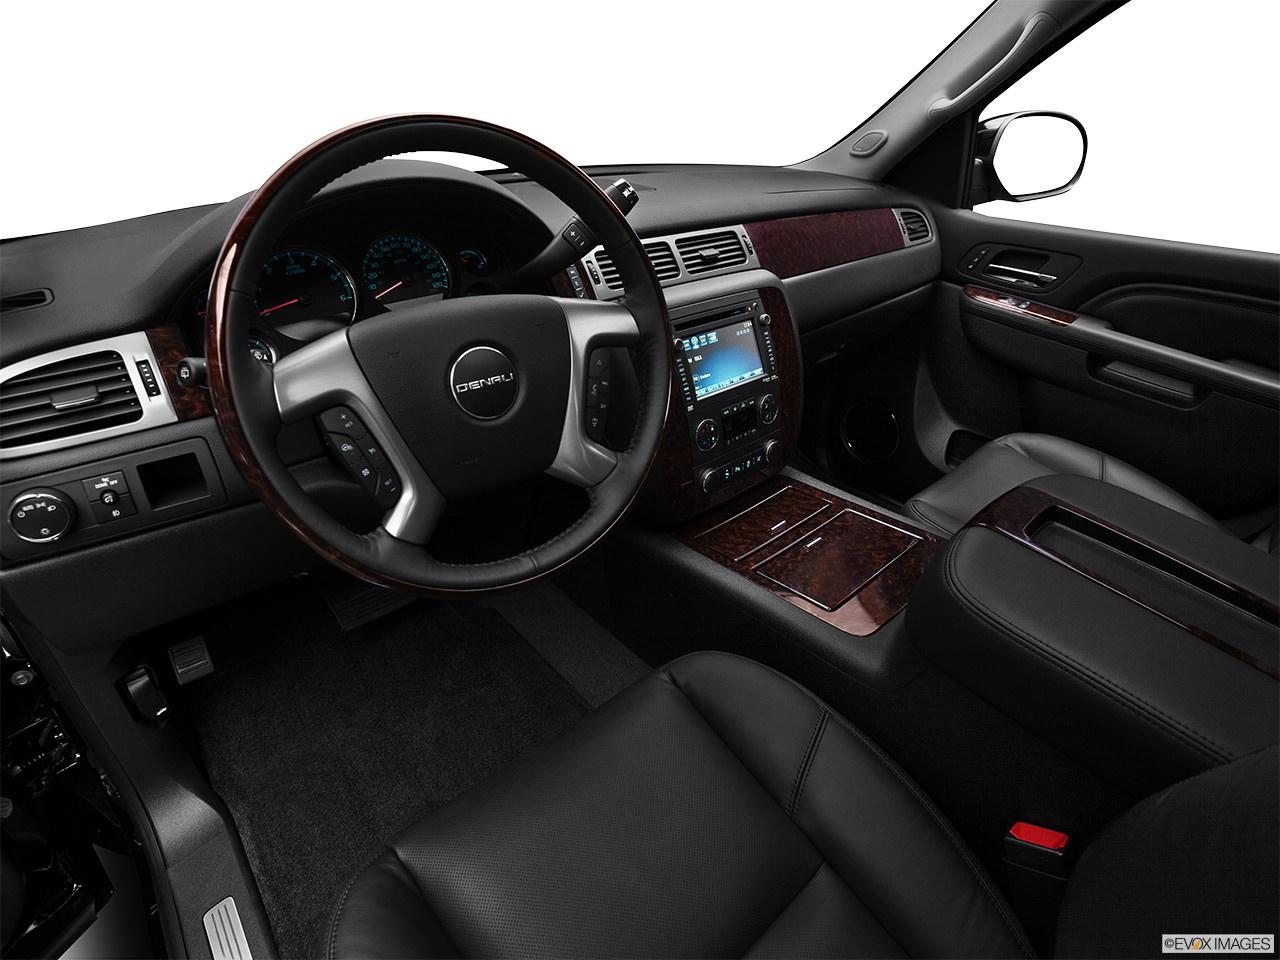 GMC Yukon XL 2012 Interior